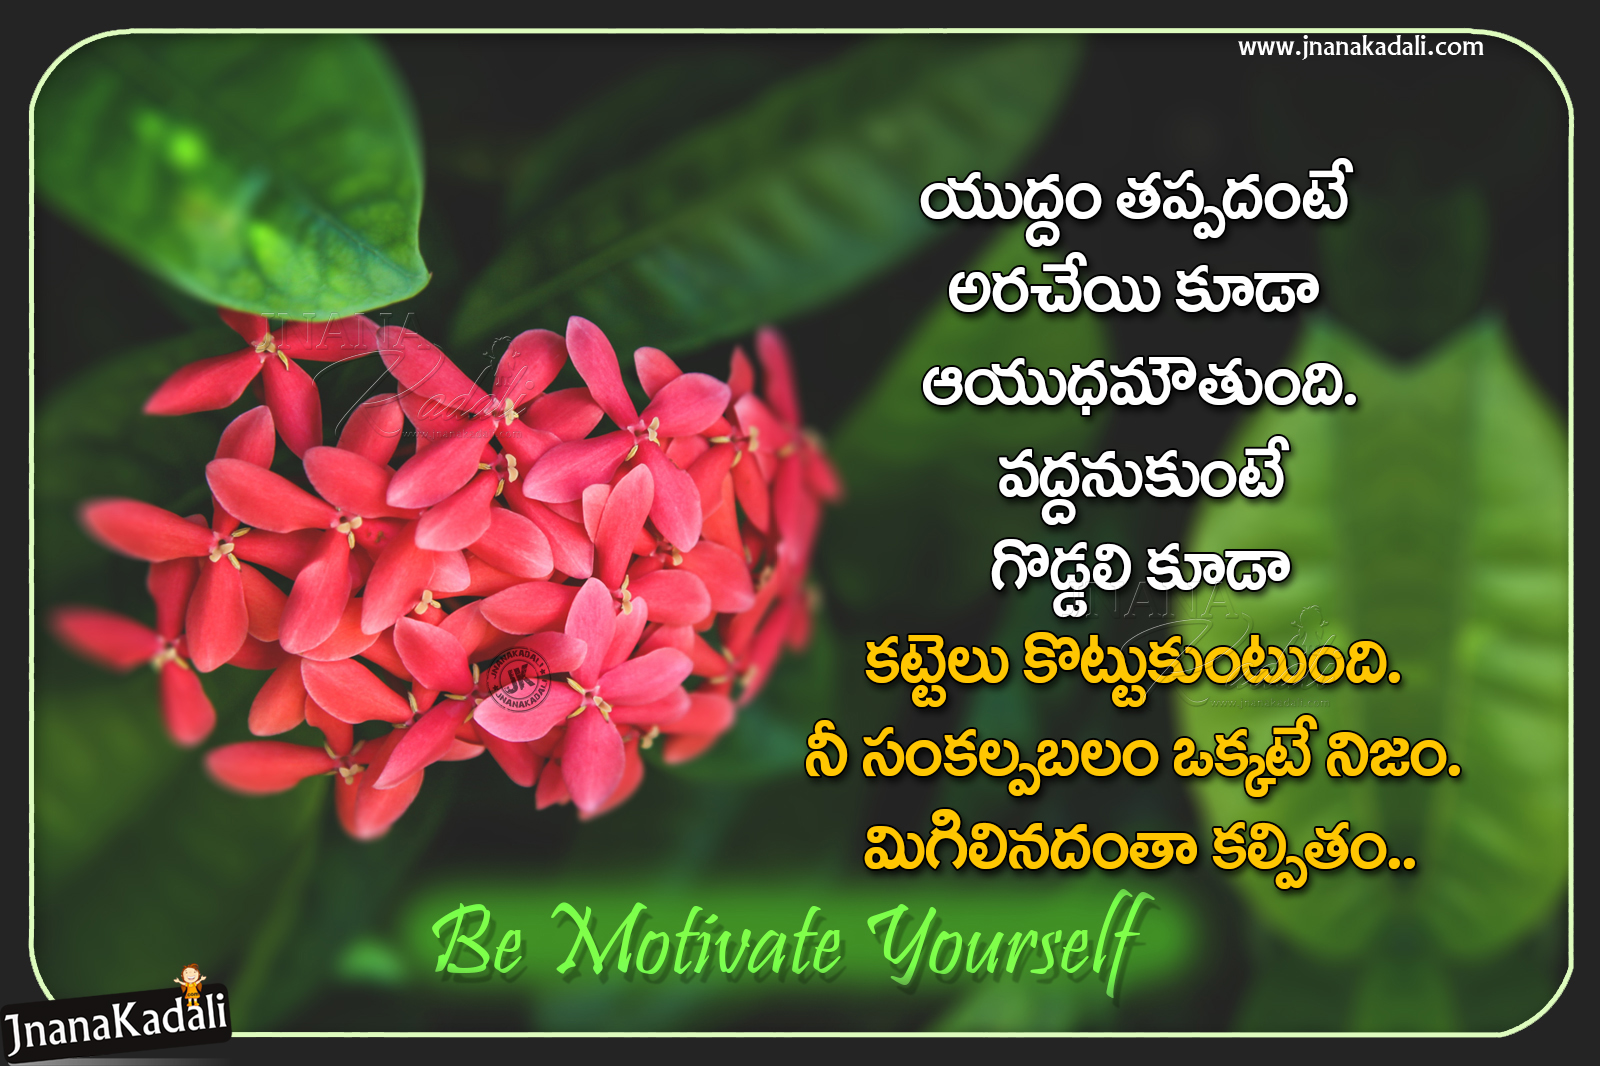 Top Telugu Motivational Sayings In Telugu Self Motivational Quotes Free Download For Sharing Jnana Kadali Com Telugu Quotes English Quotes Hindi Quotes Tamil Quotes Dharmasandehalu